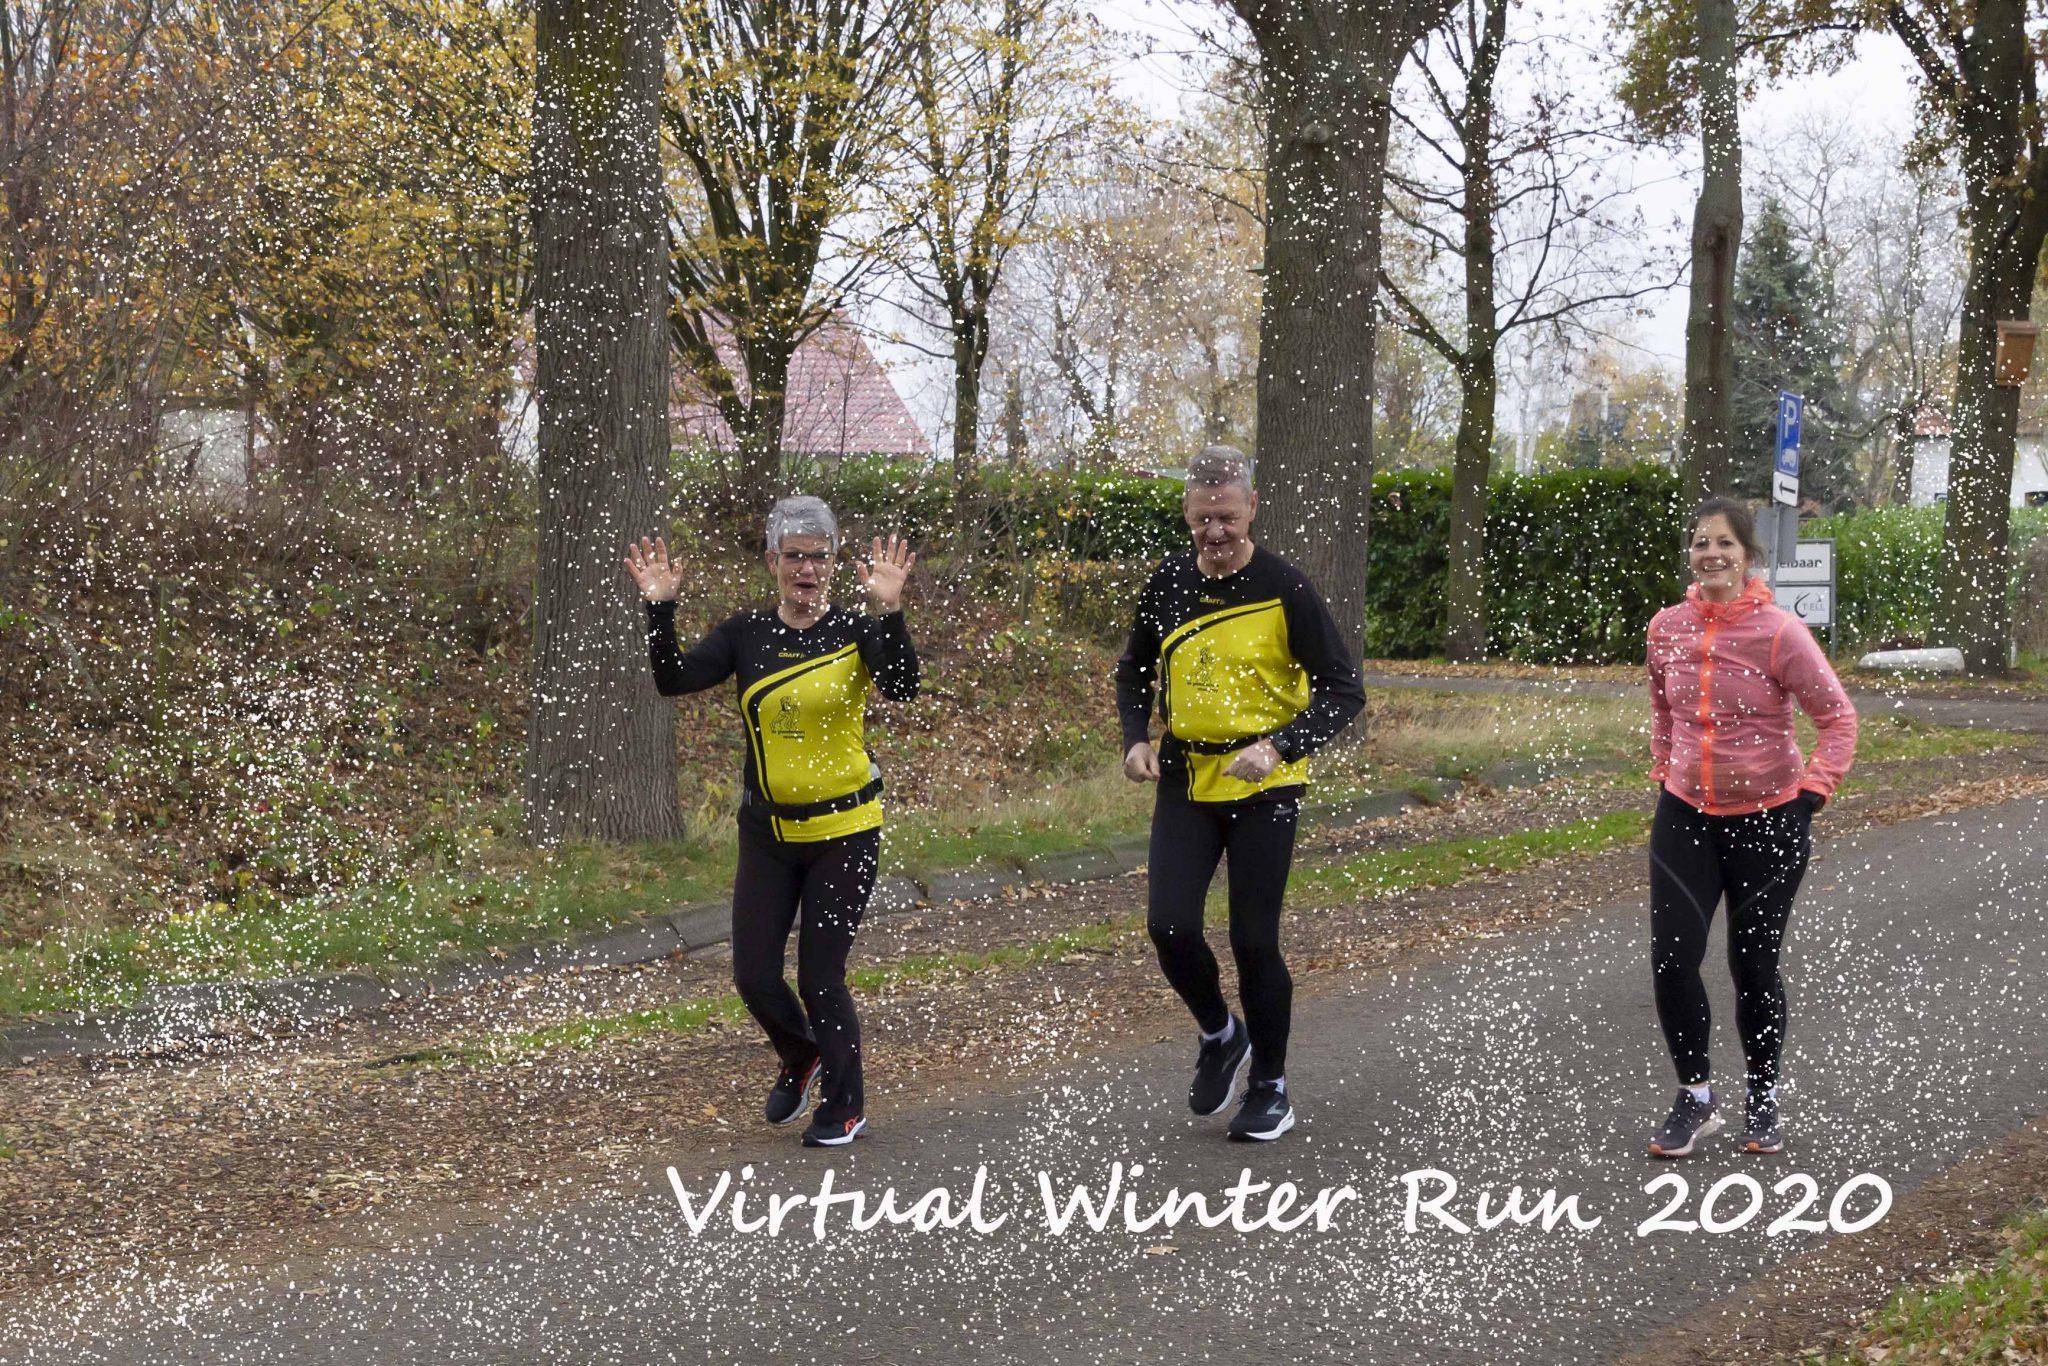 Virtuele winter run 2020